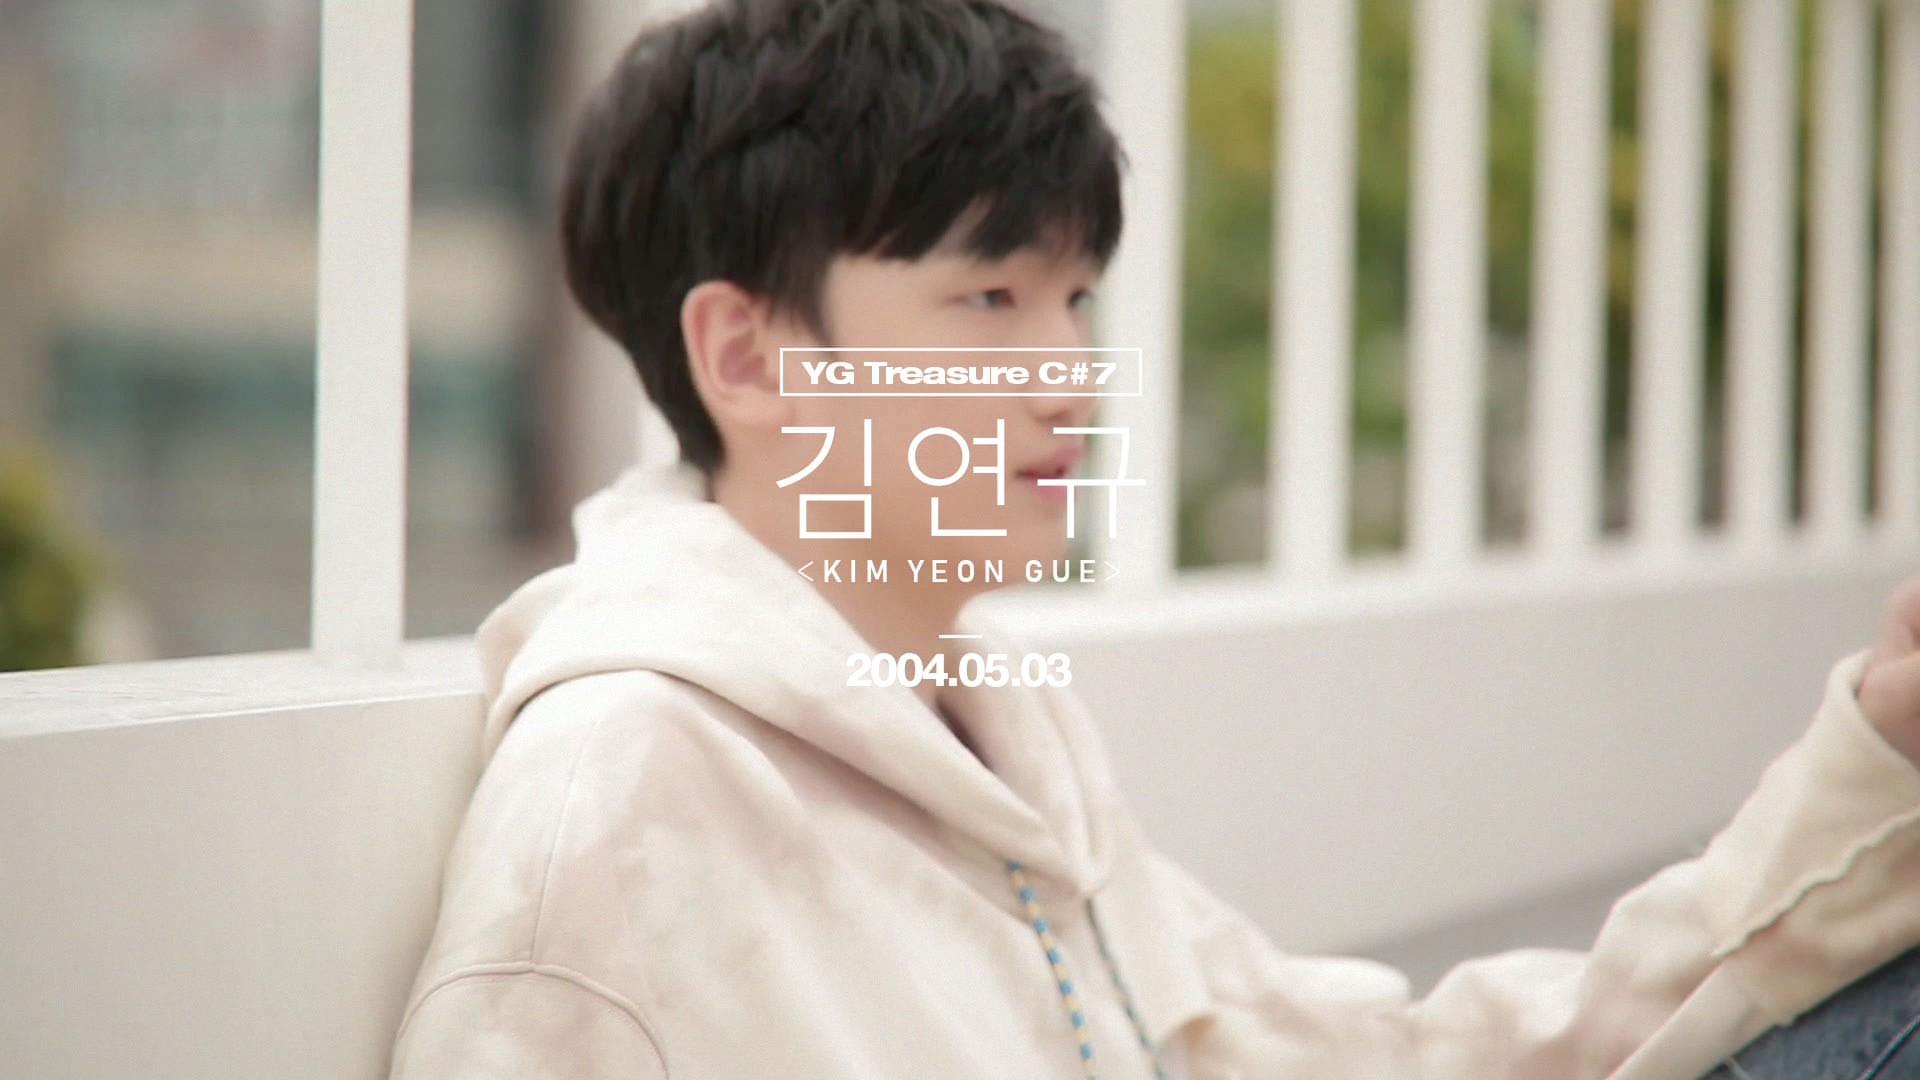 YG보석함ㅣC#7 김연규 <KIM YEONGUE> PROFILE MAKING FILM